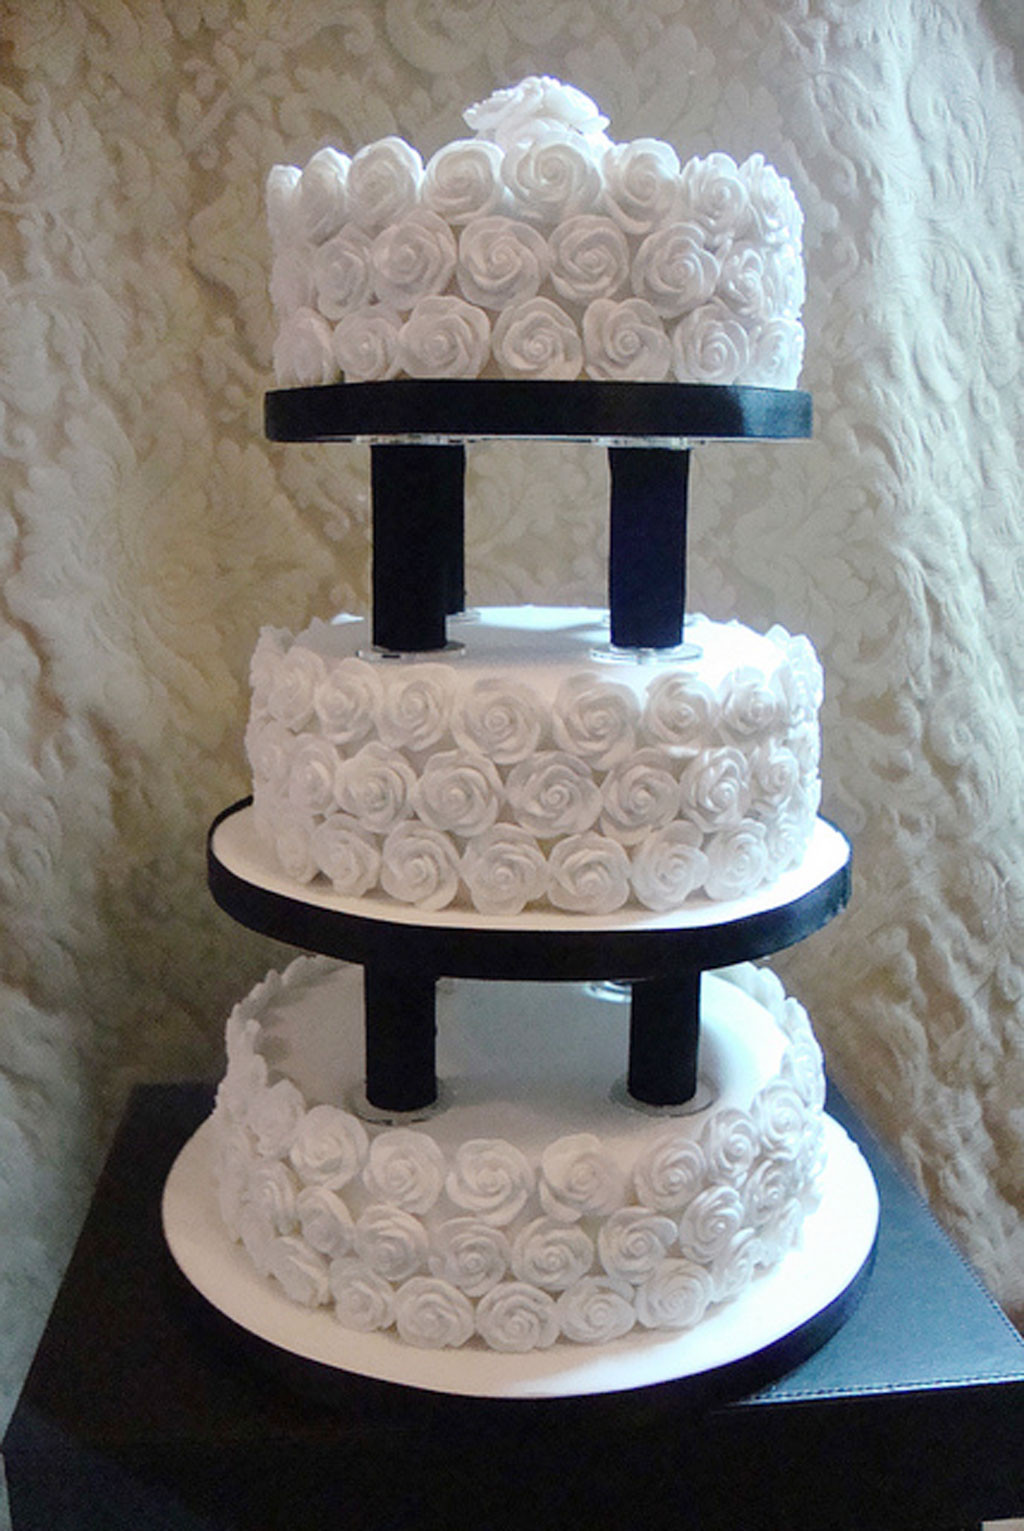 Wedding Cakes With Pillars  Wedding Cake Pillars And Plates Wedding Cake Cake Ideas